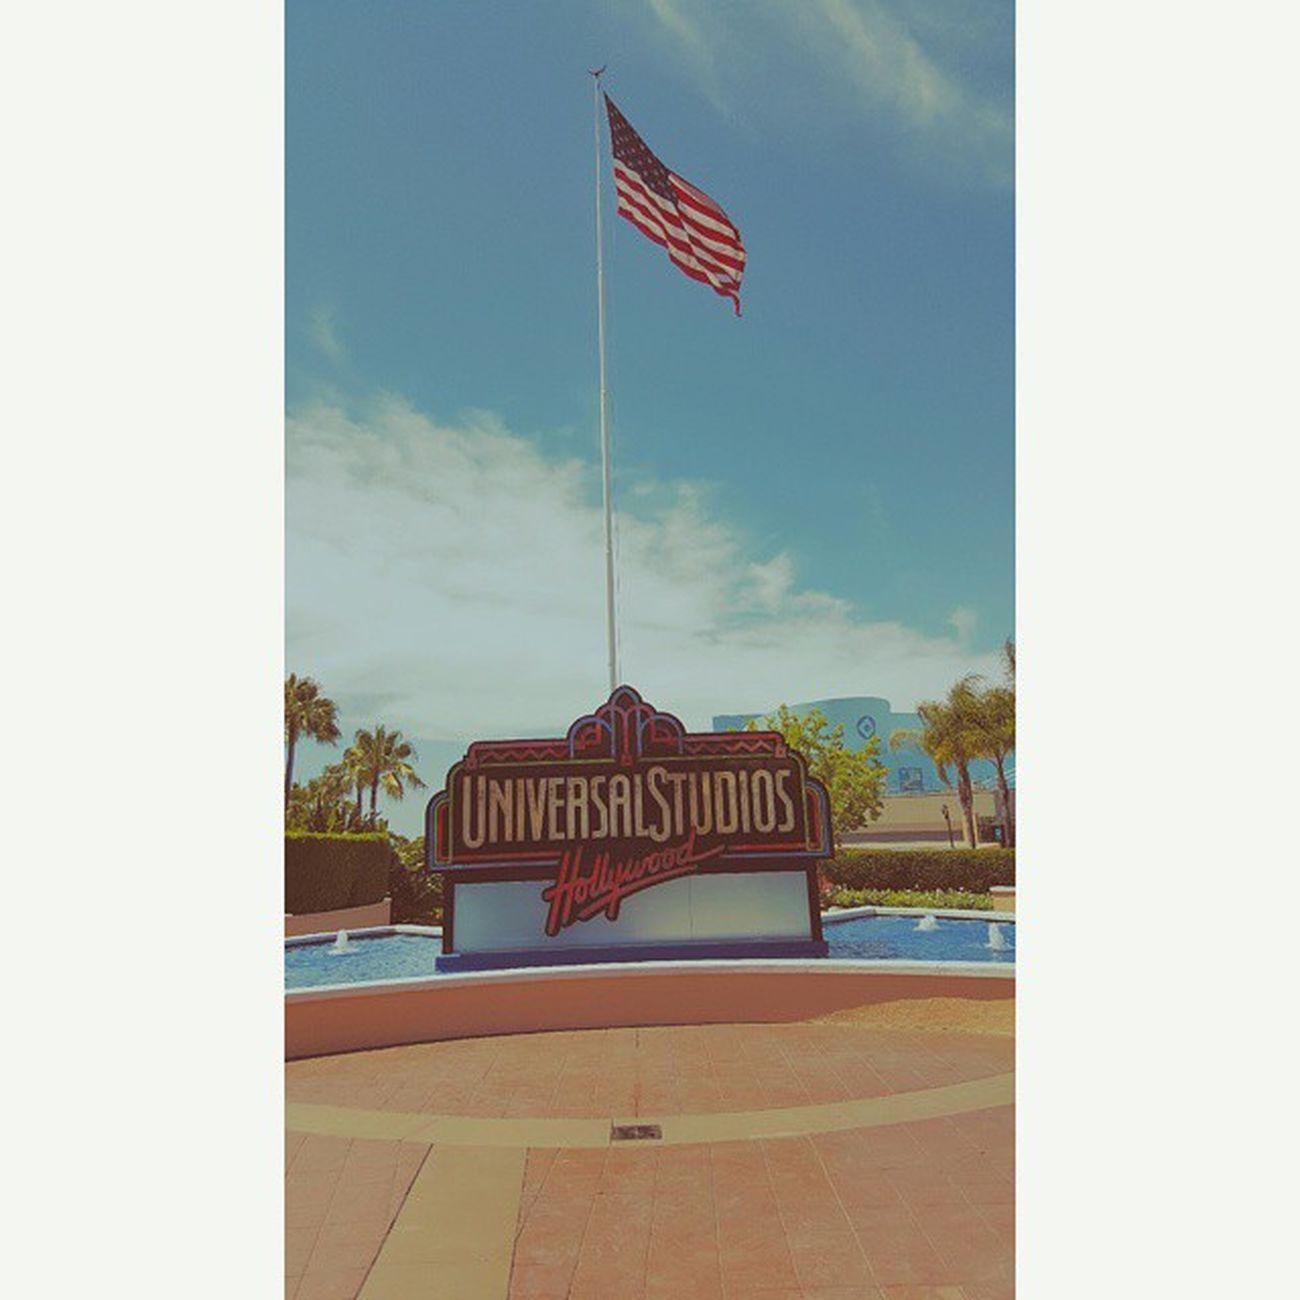 Universal Studios Hollywood LAX Hollywood USA Universalstudios Vscocam Squareinstapic @studio8apps